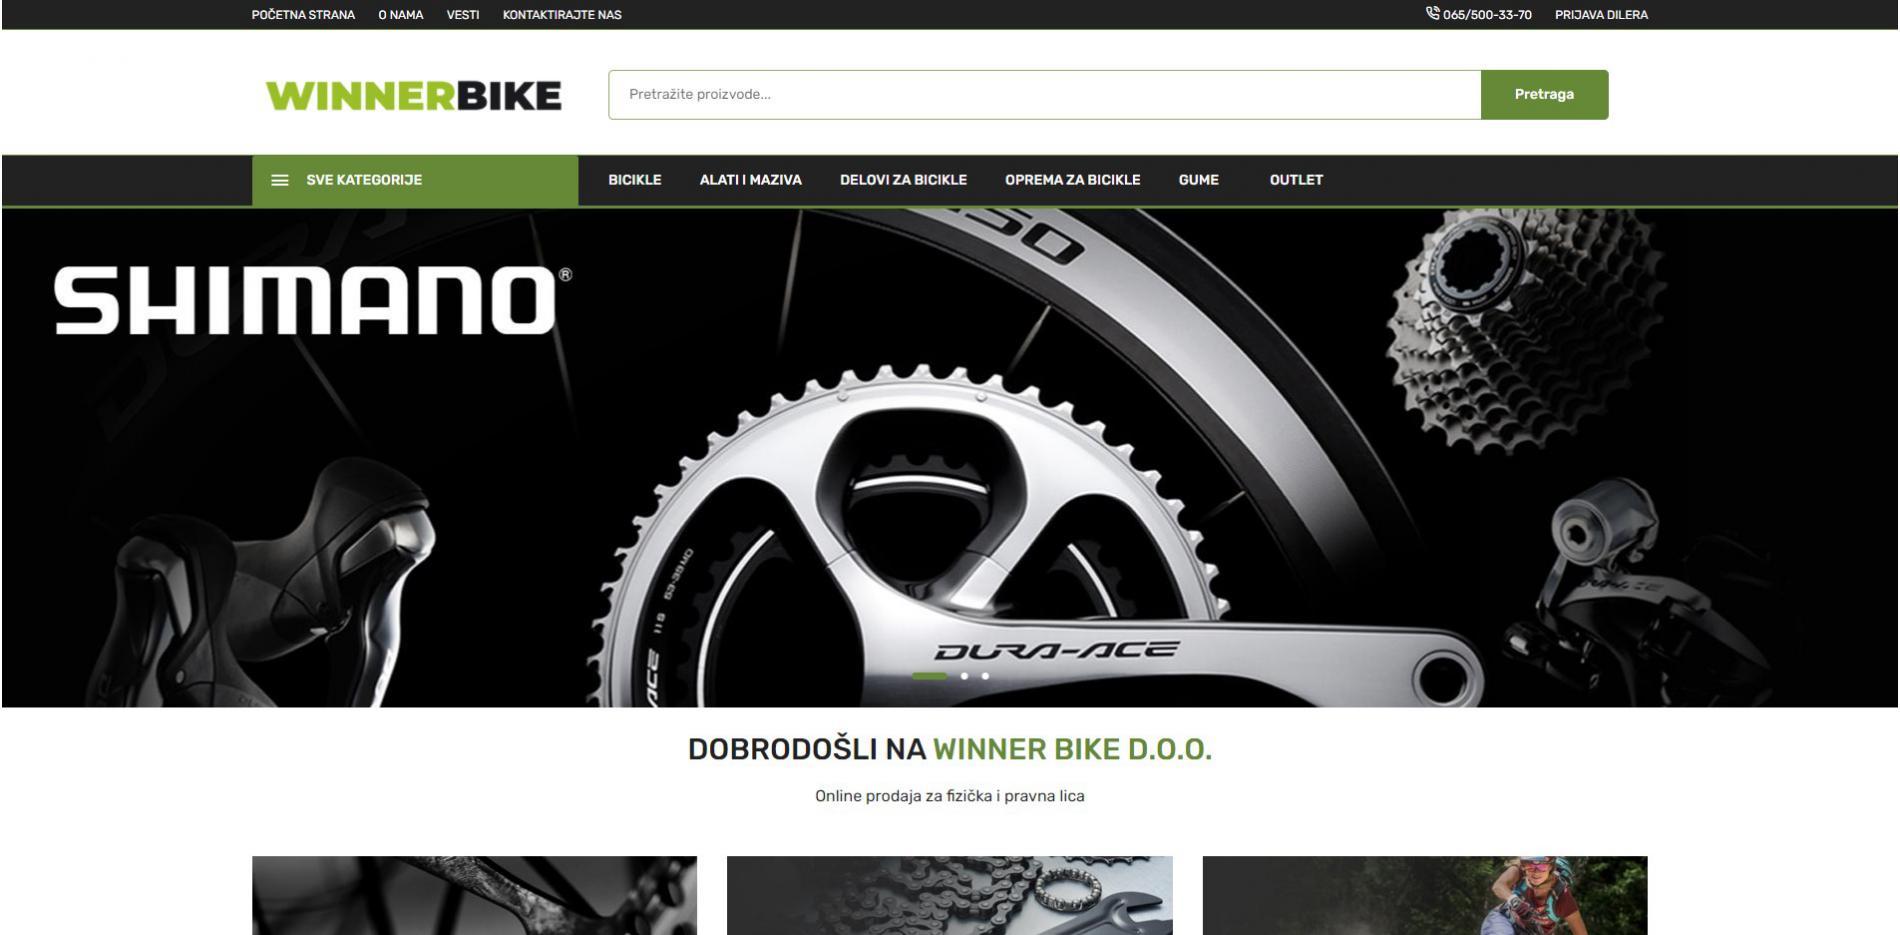 Winner Bike